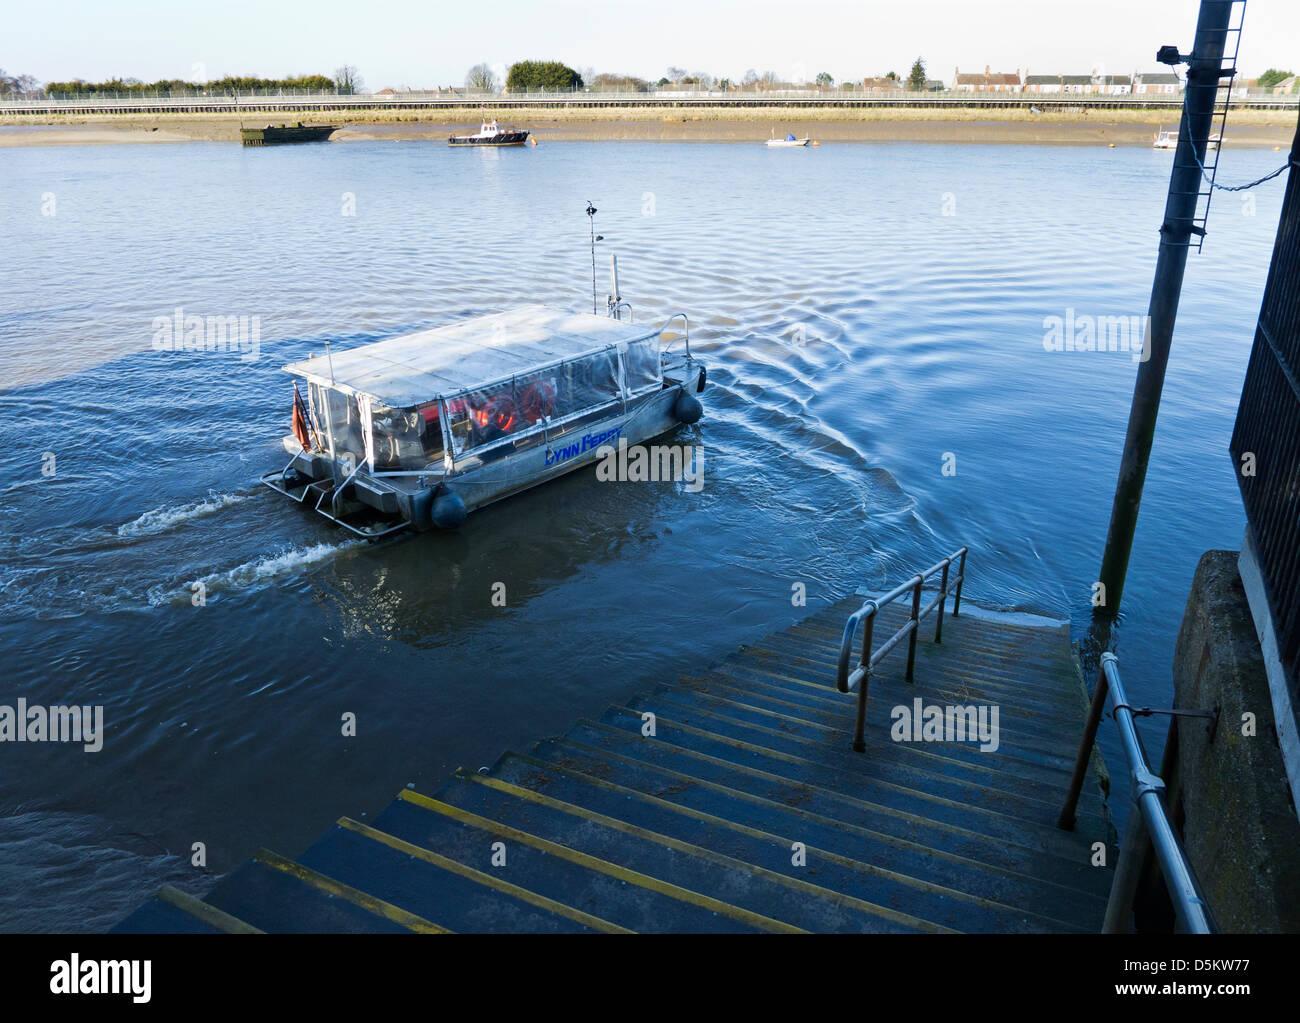 west lynn ferry stock photos & west lynn ferry stock images - alamy